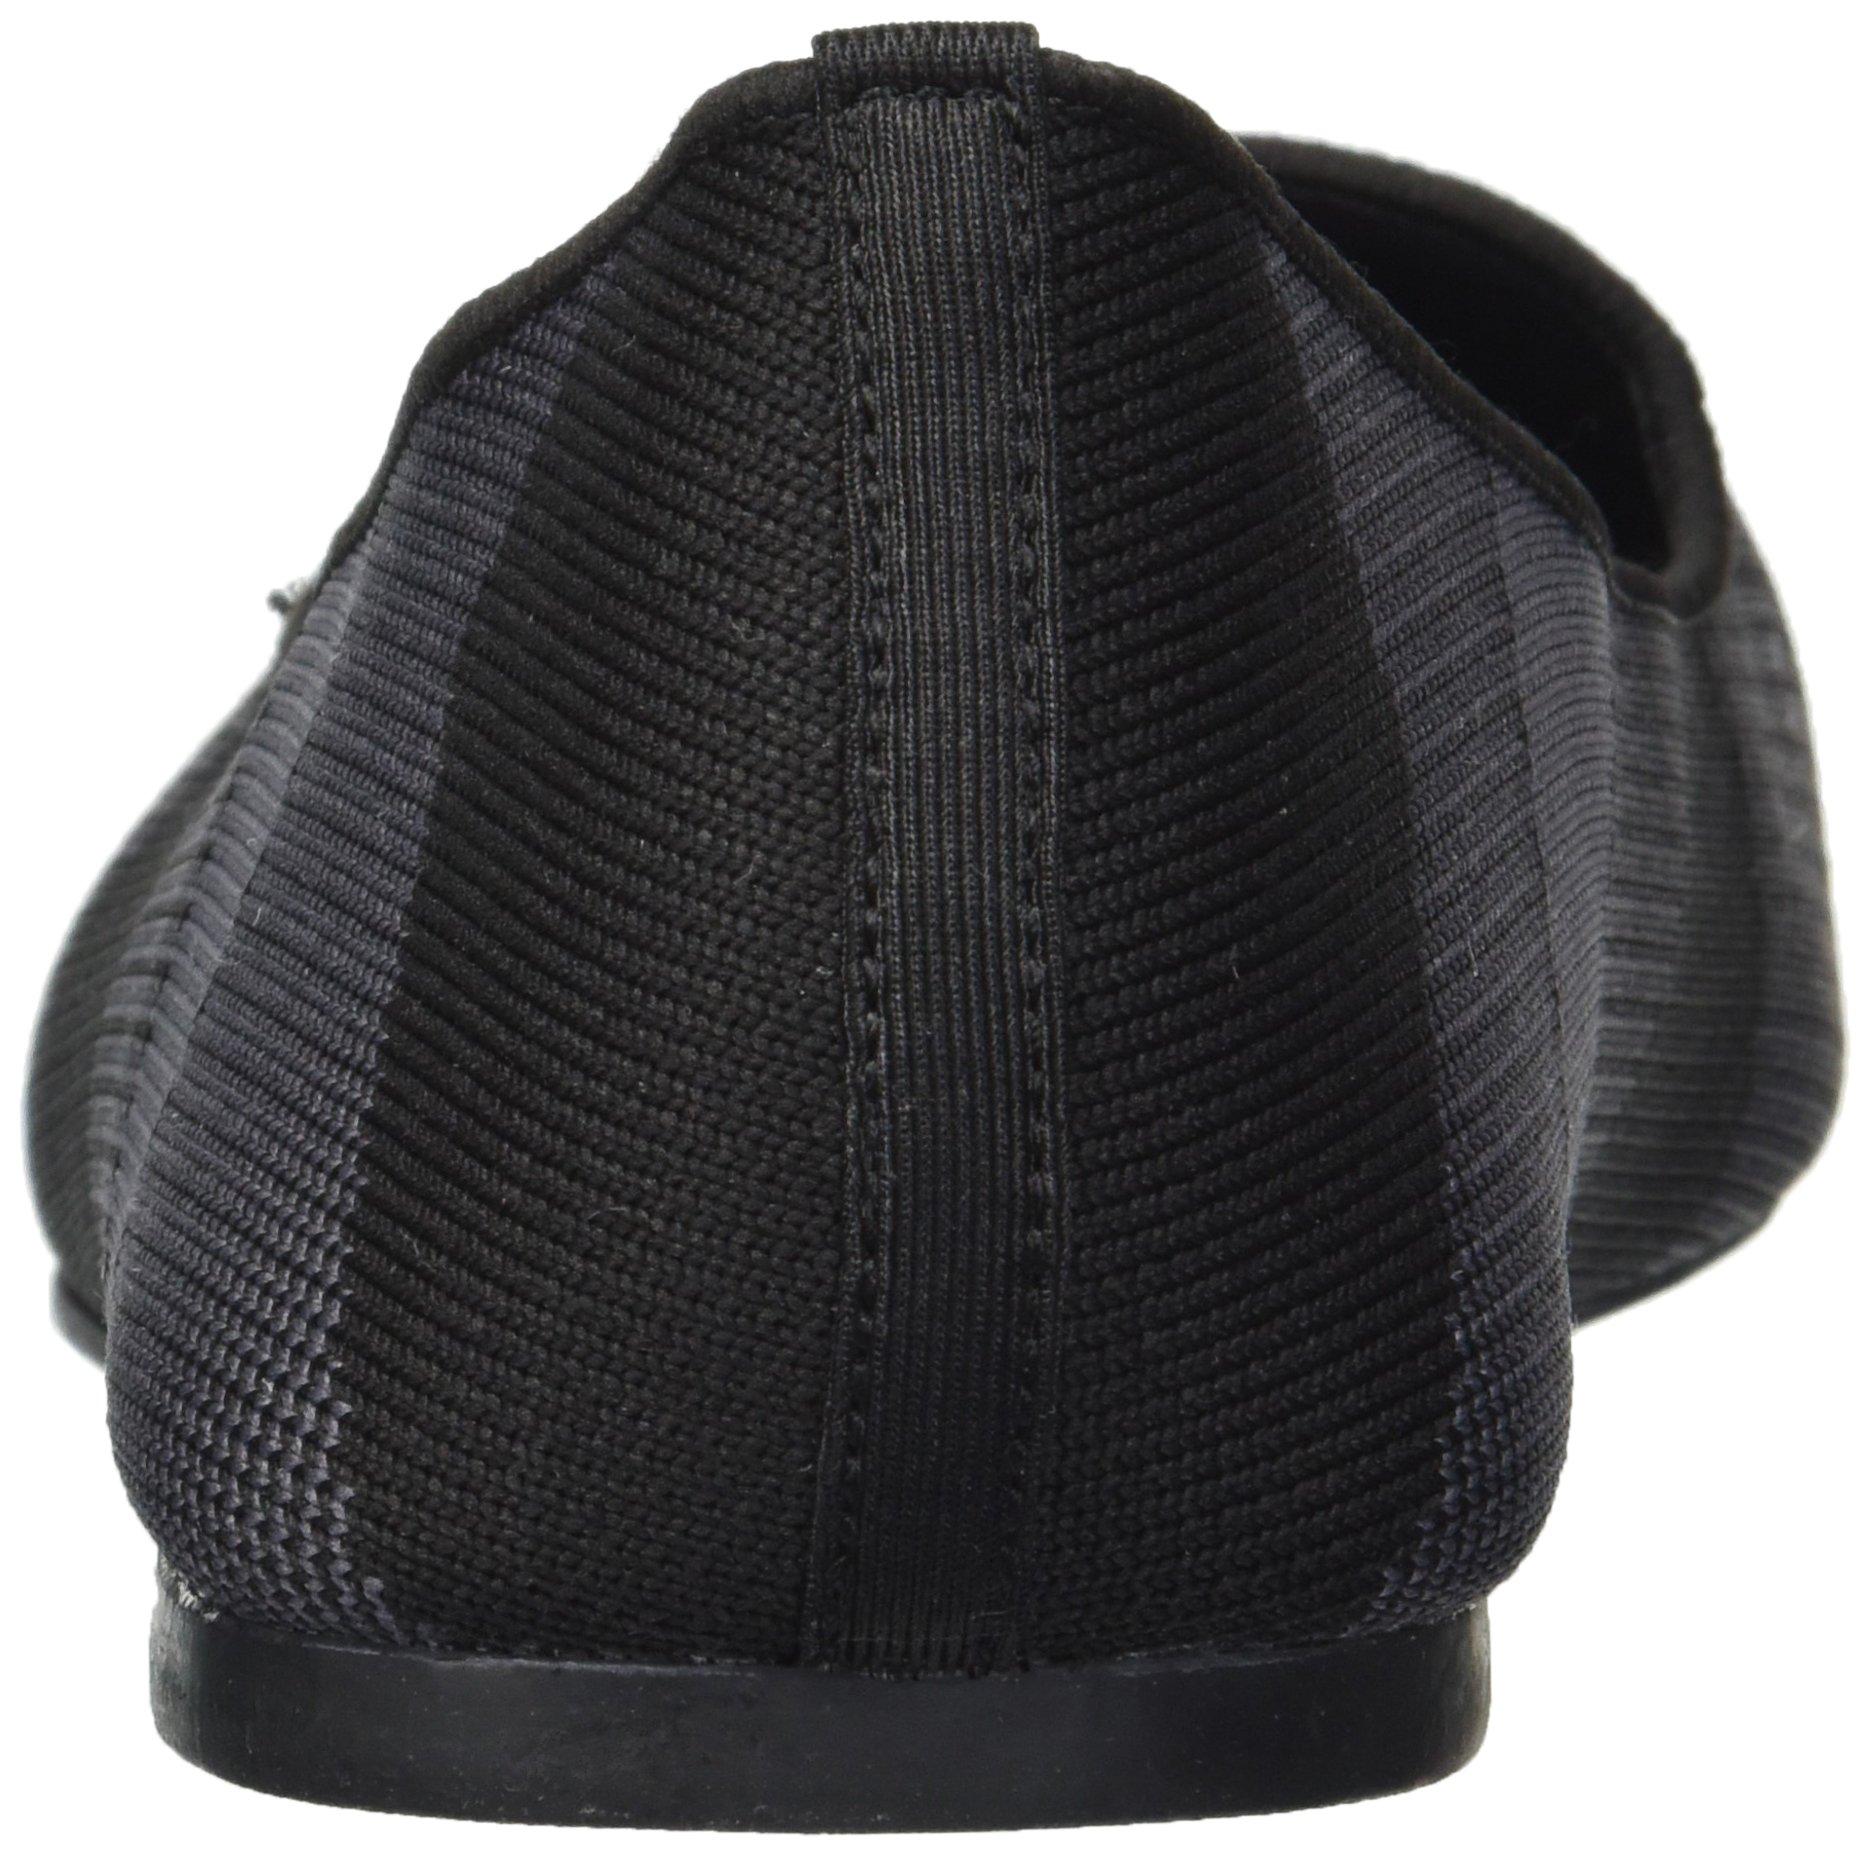 Skechers Women's Cleo-Sherlock-Engineered Knit Loafer Skimmer Ballet Flat, Black, 6.5 M US by Skechers (Image #2)